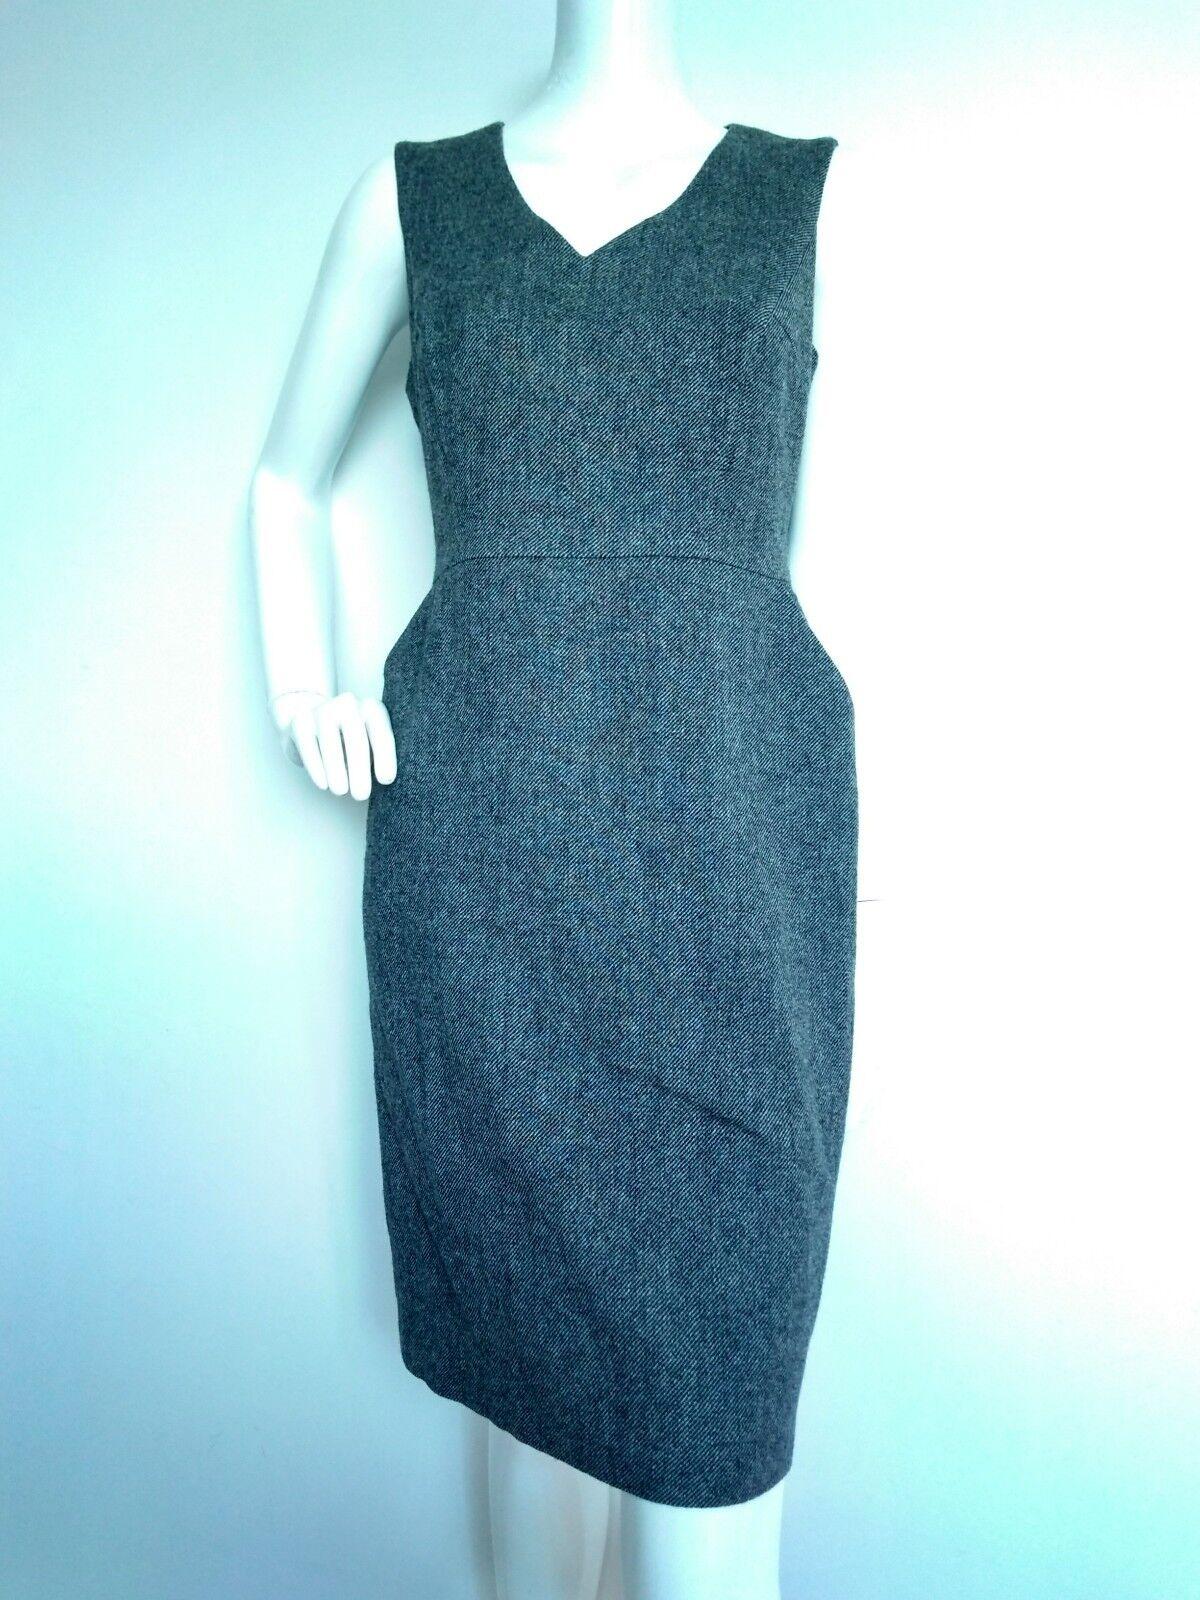 LK BENNETT Freida shift dress size 12 --BRAND NEW-100%Lambswool NEW-100%Lambswool NEW-100%Lambswool knee length 3a6b34